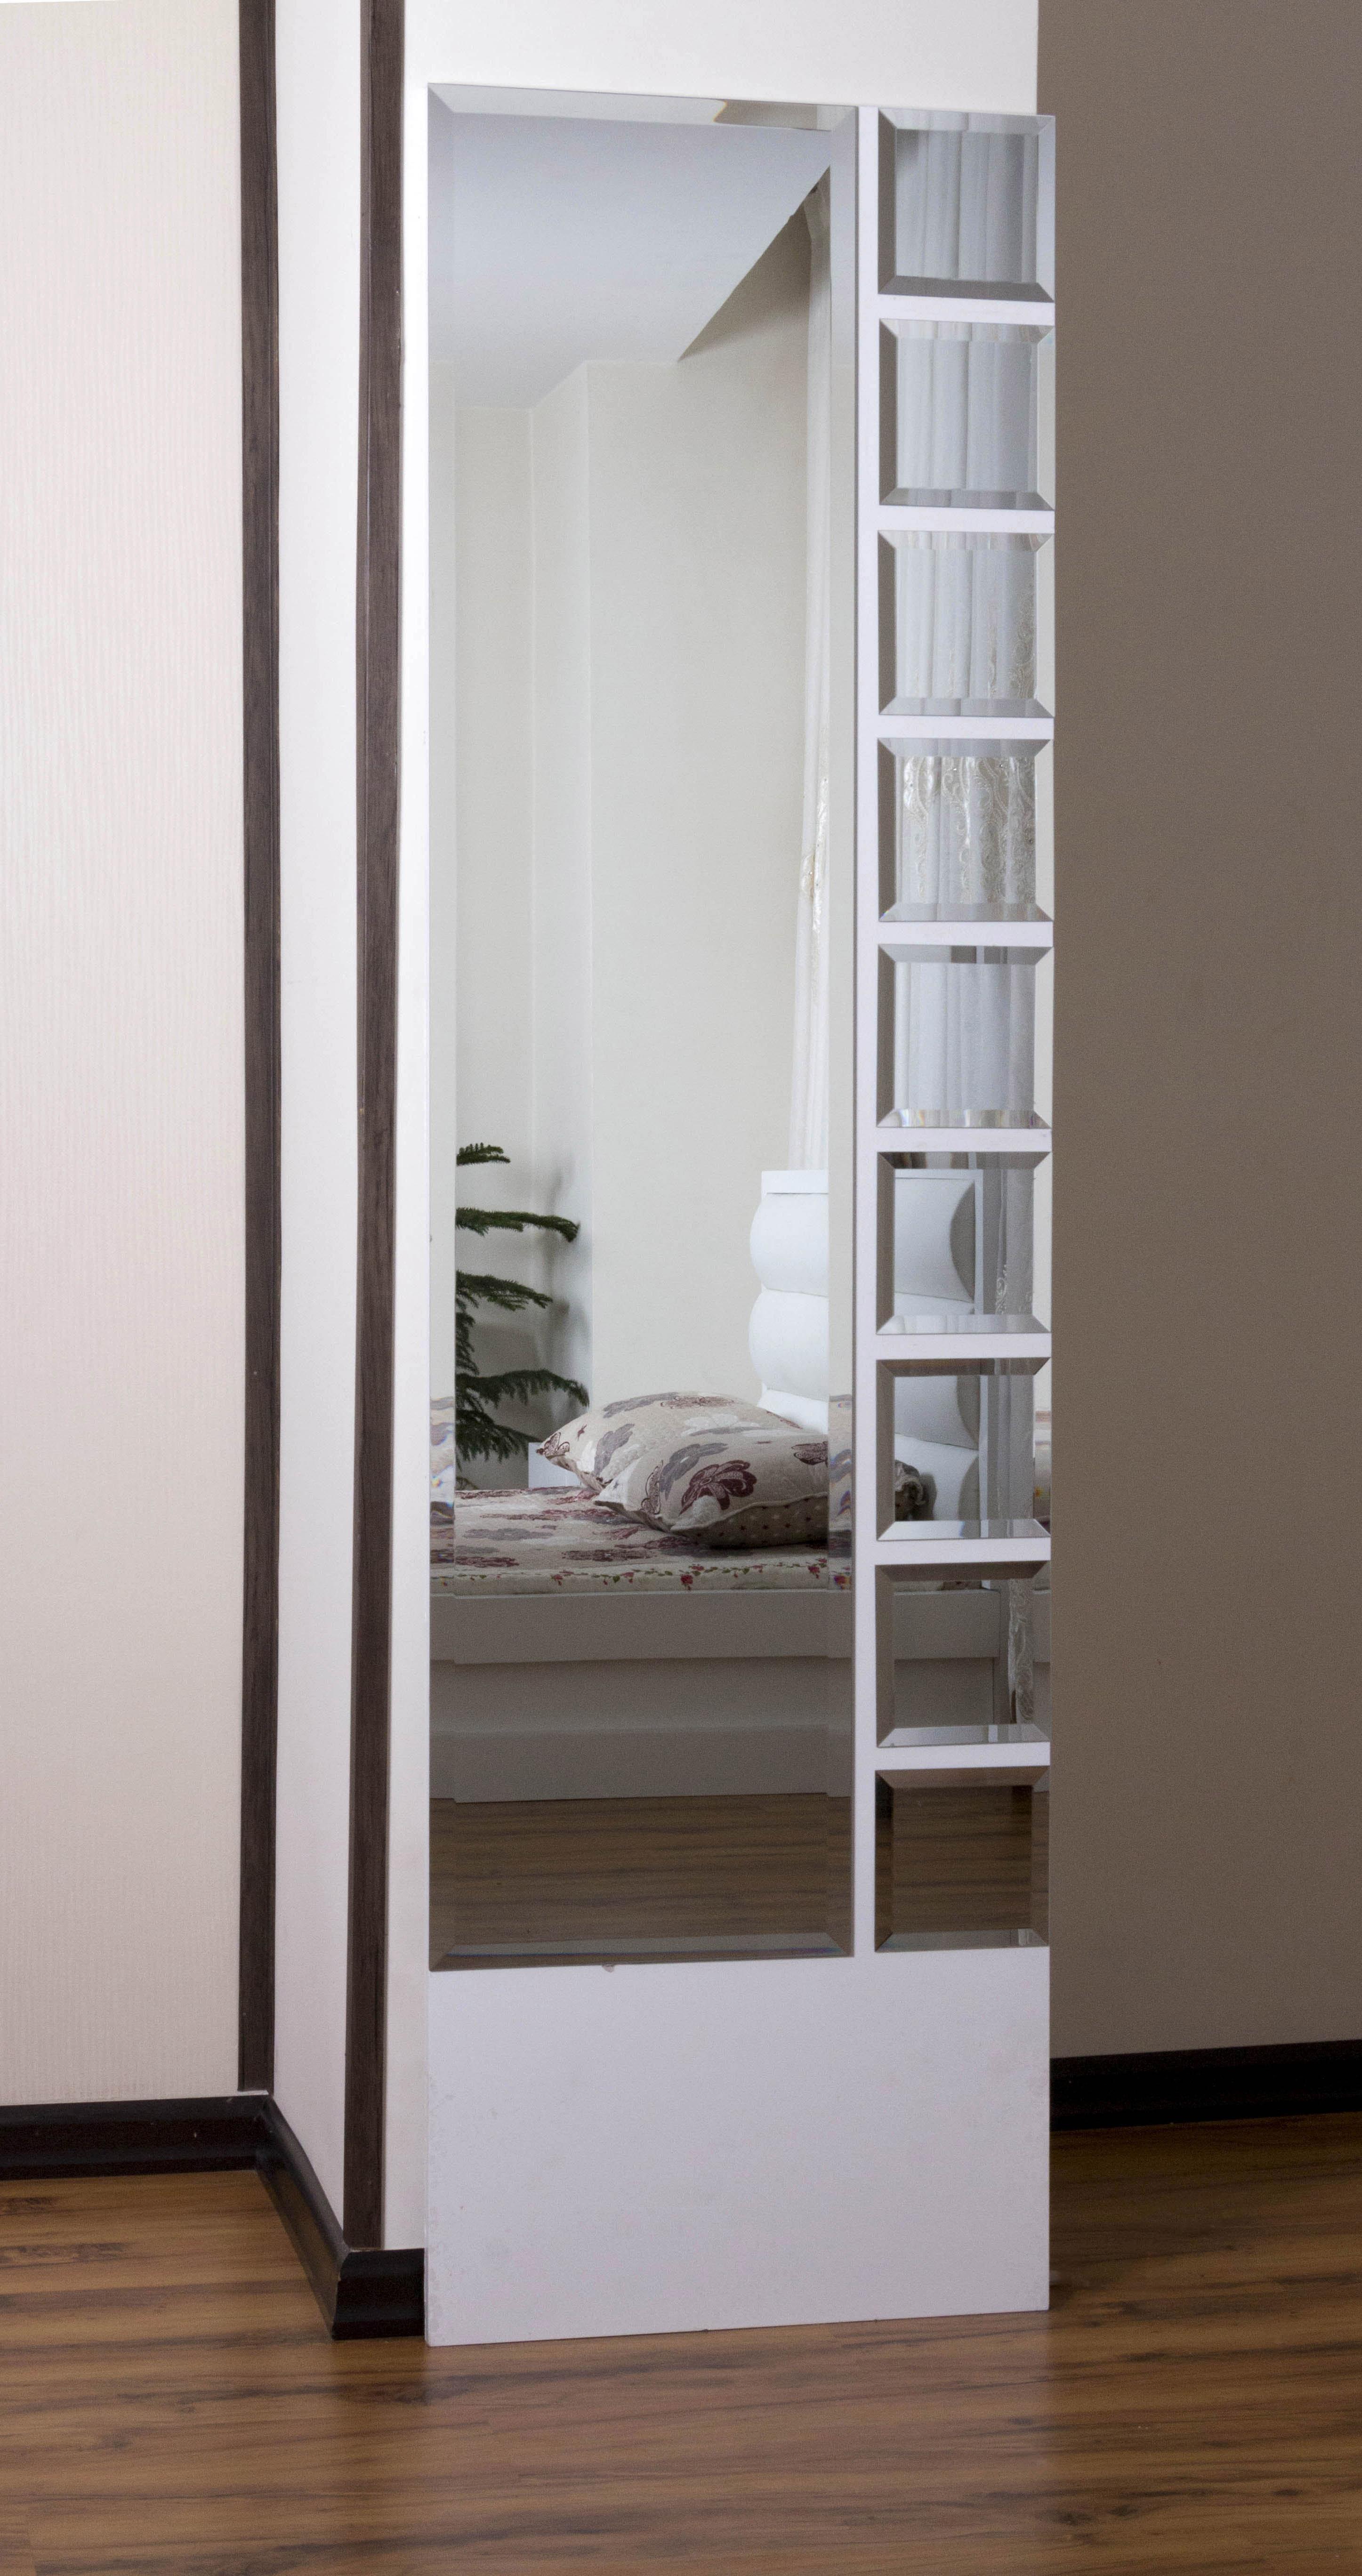 قاب آینه قدی اریکا